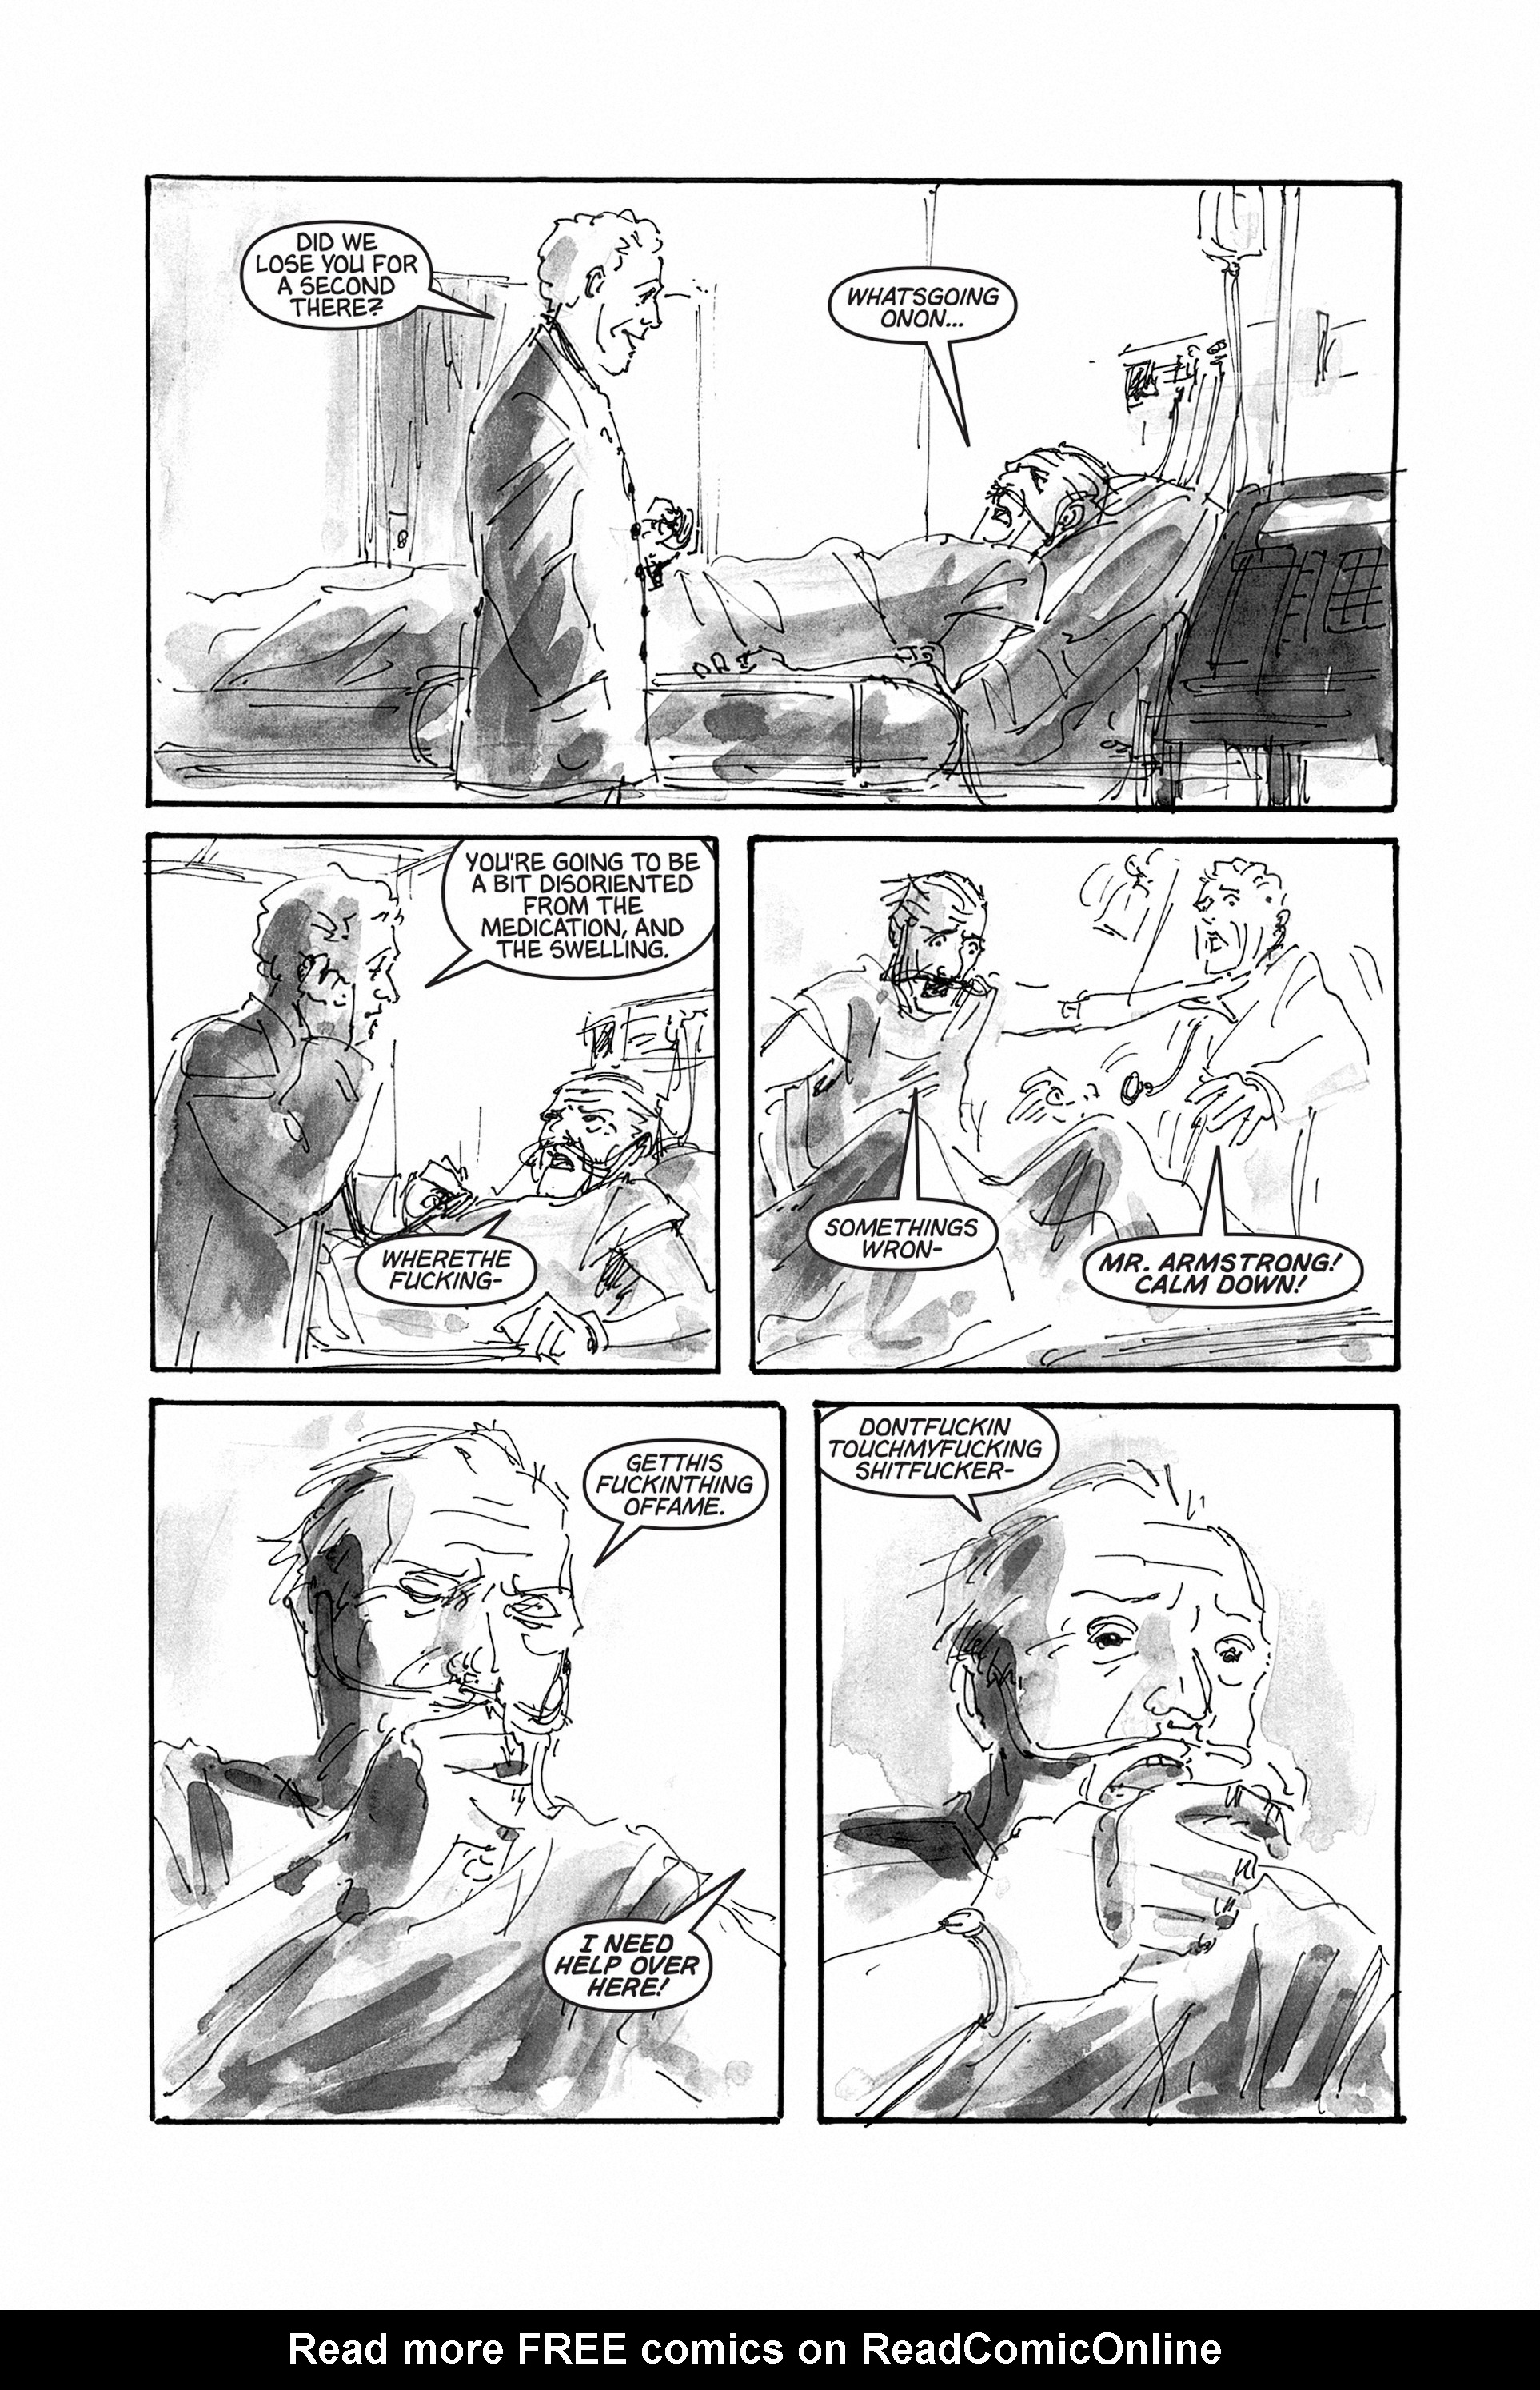 Read online Tumor comic -  Issue # TPB - 19